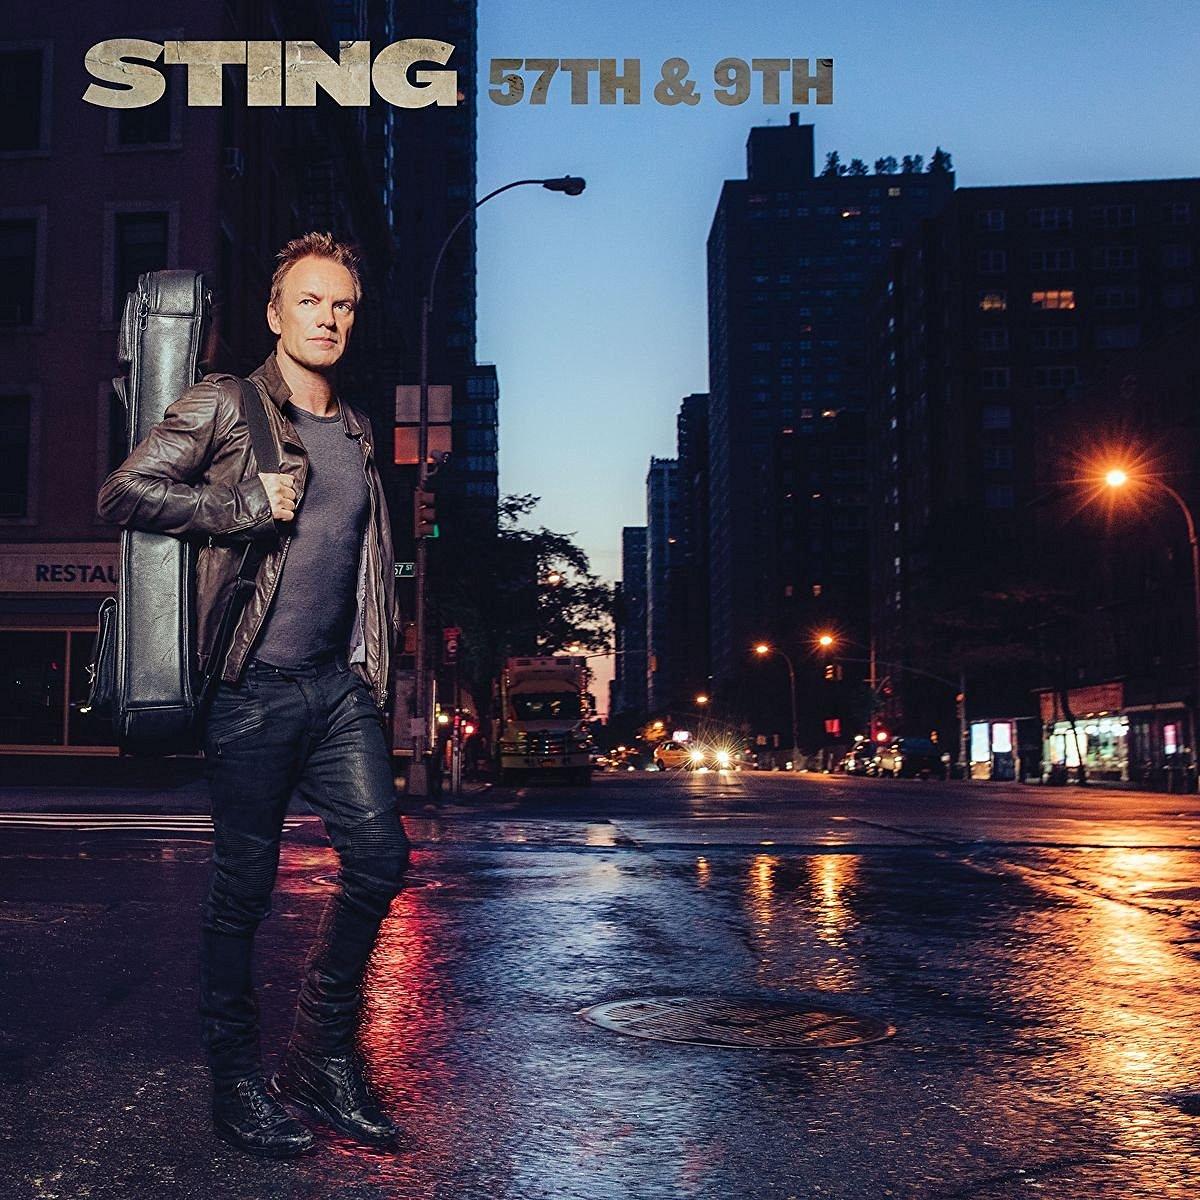 1398126-306639-Audio-Cd-Sting-57Th-amp-9Th